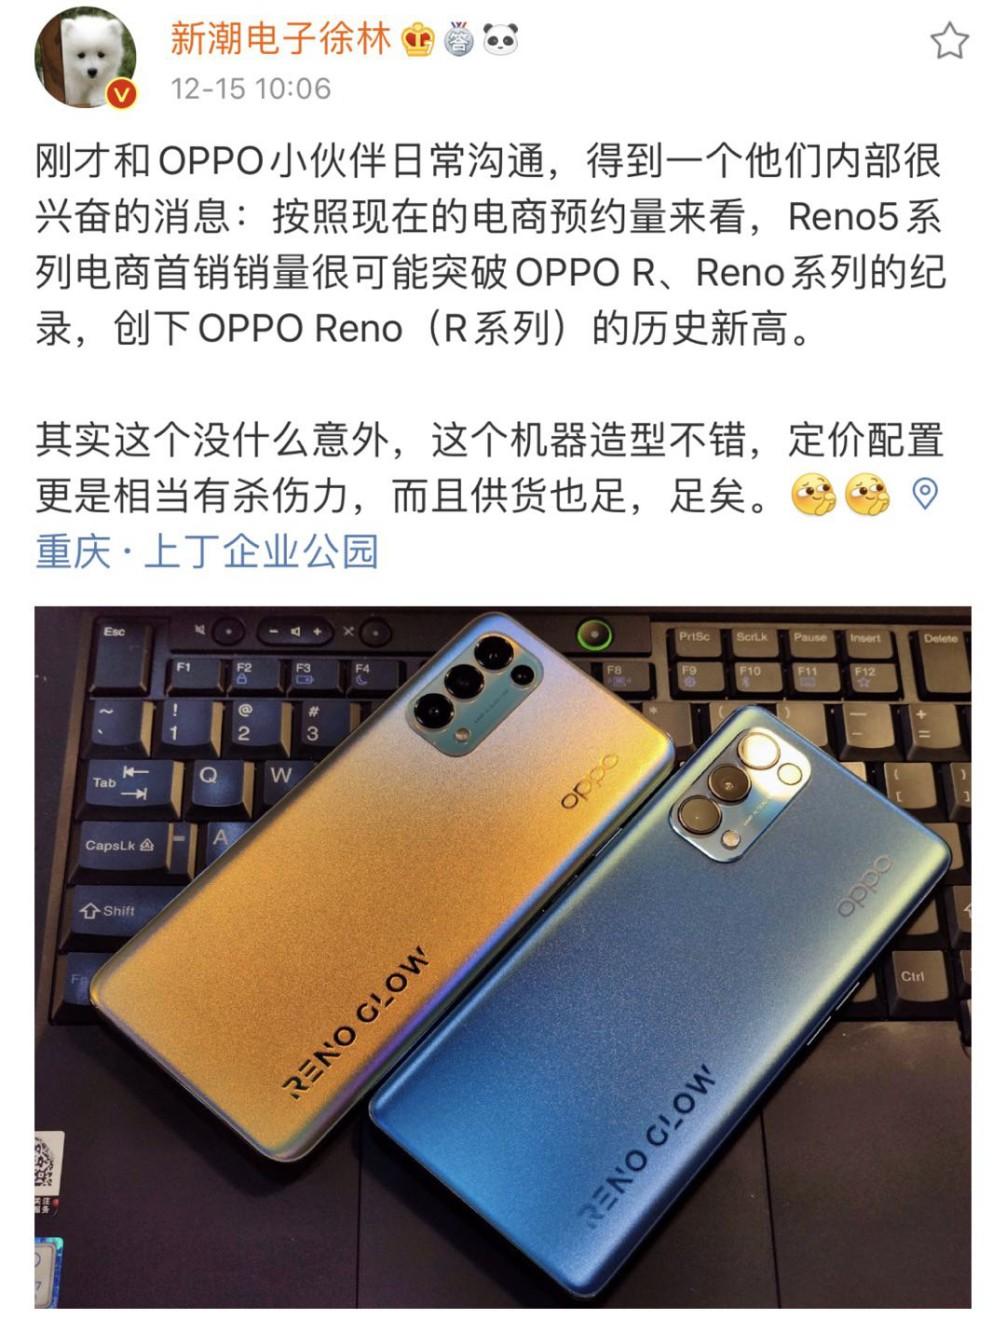 OPPO Reno5系列预订火爆 首销销量有望创新高